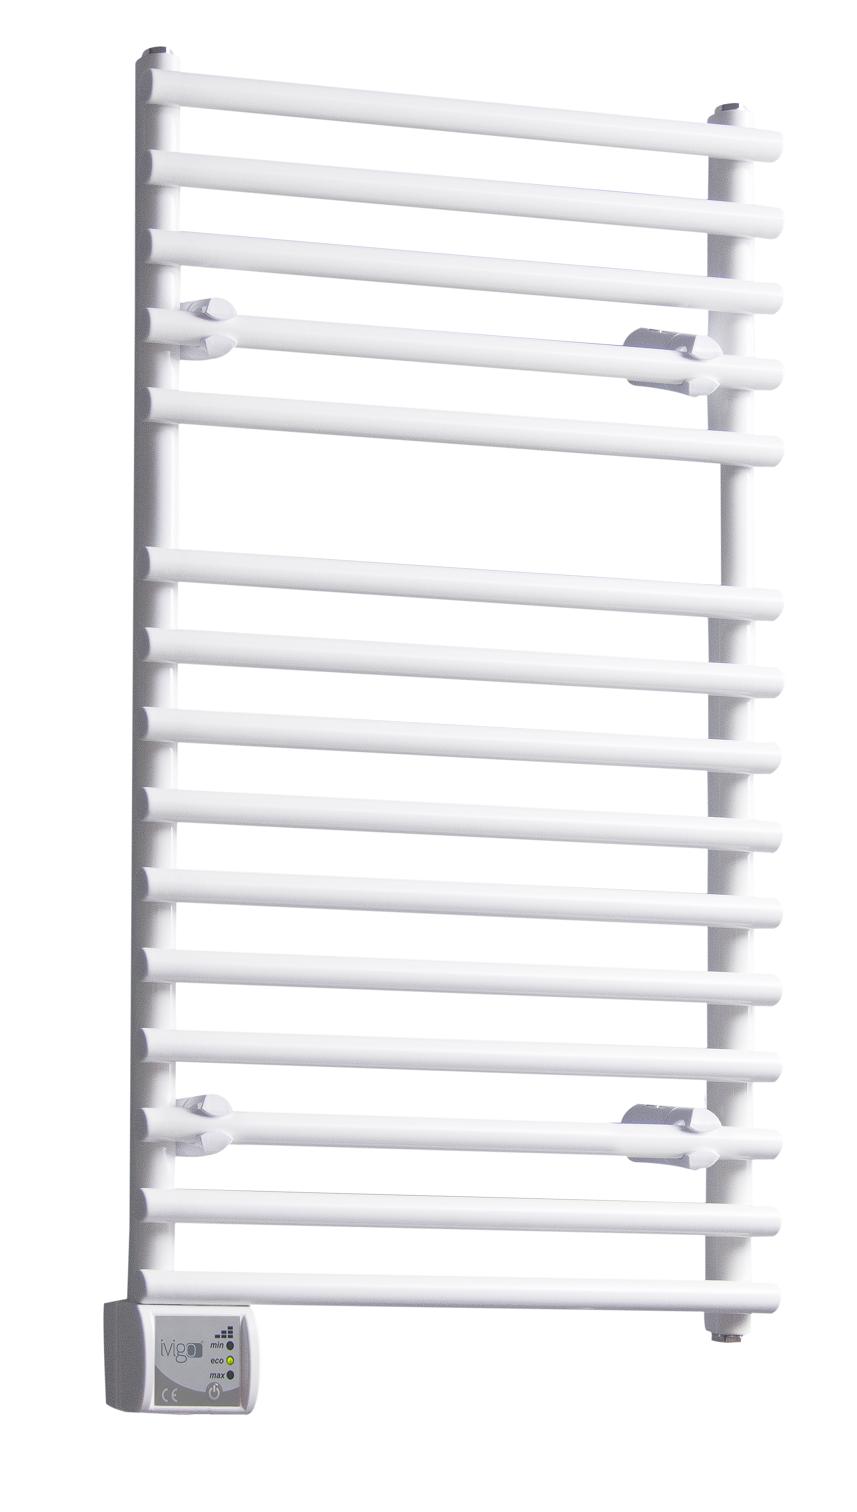 Radiator (calorifer) baie portprosop electric iVigo EHR 5012, 275 W, 500x650 mm, alb imagine fornello.ro